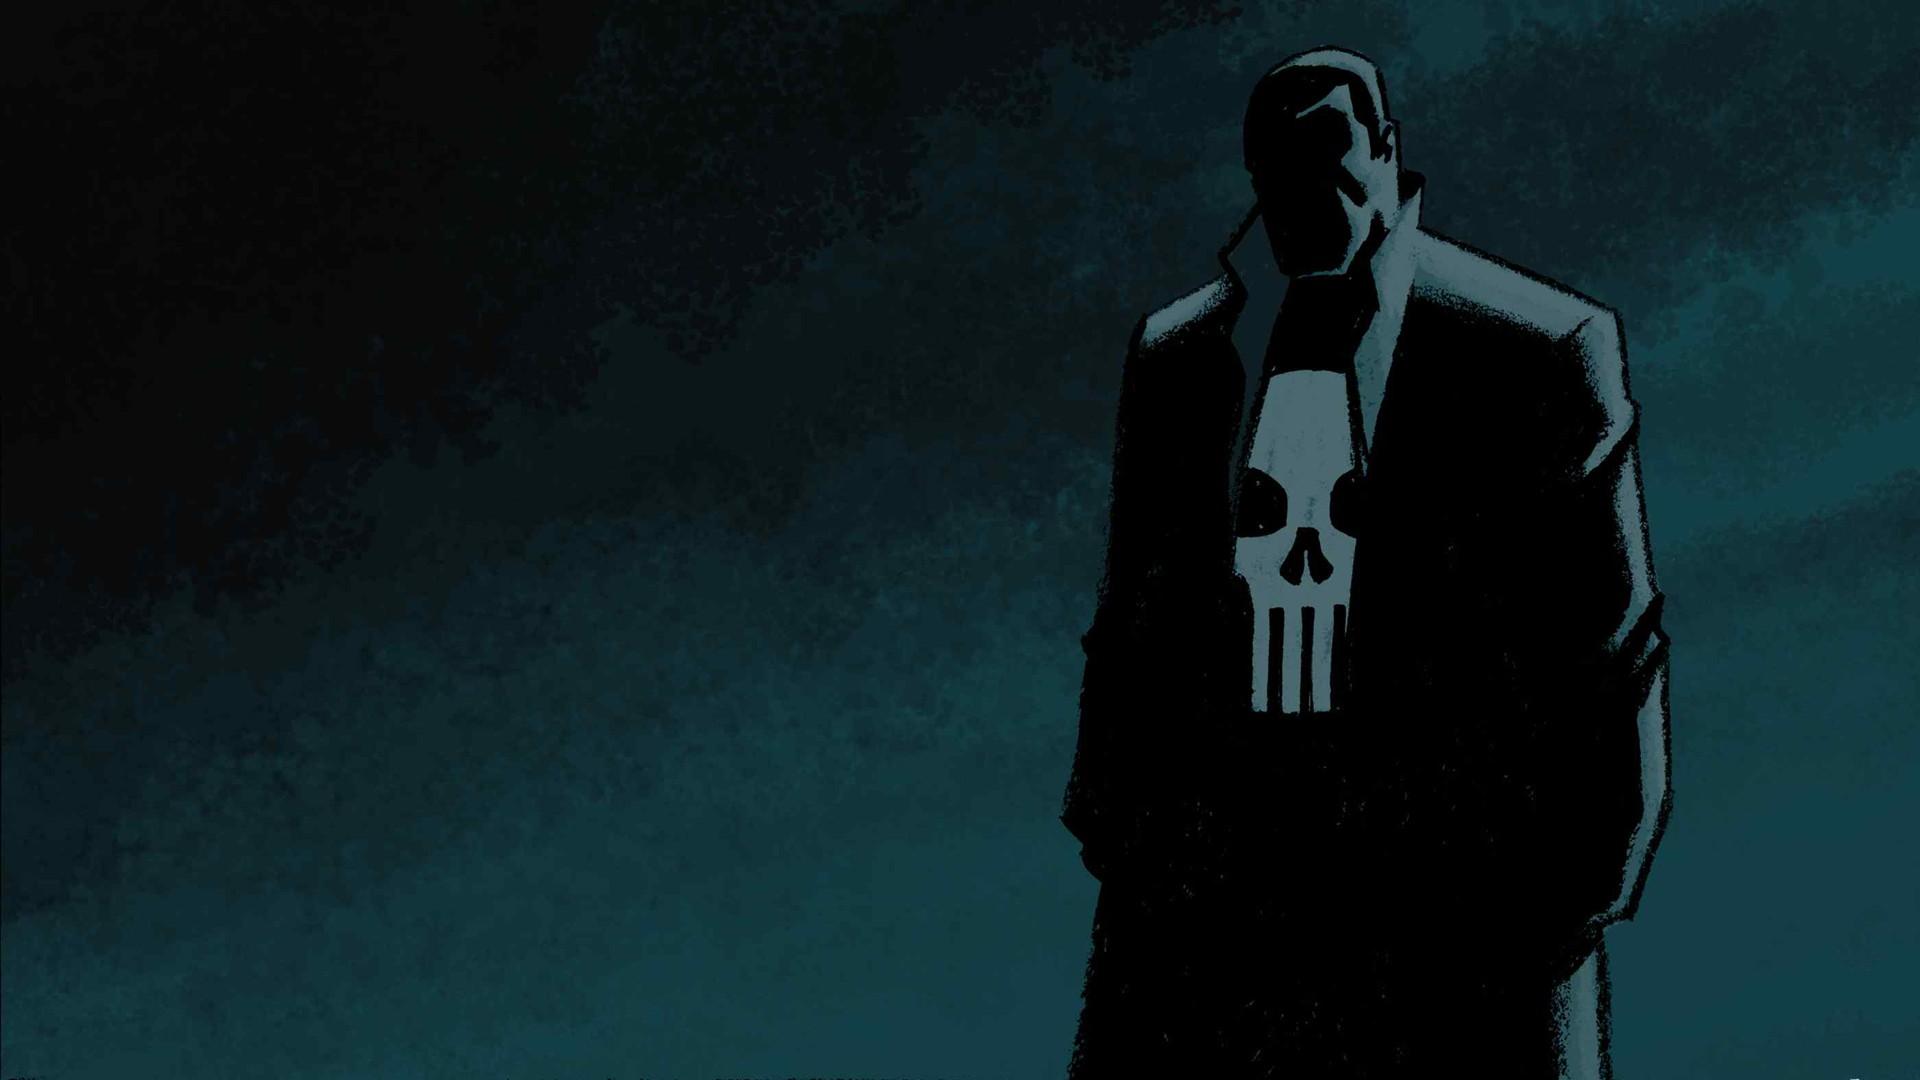 The Punisher Wallpaper